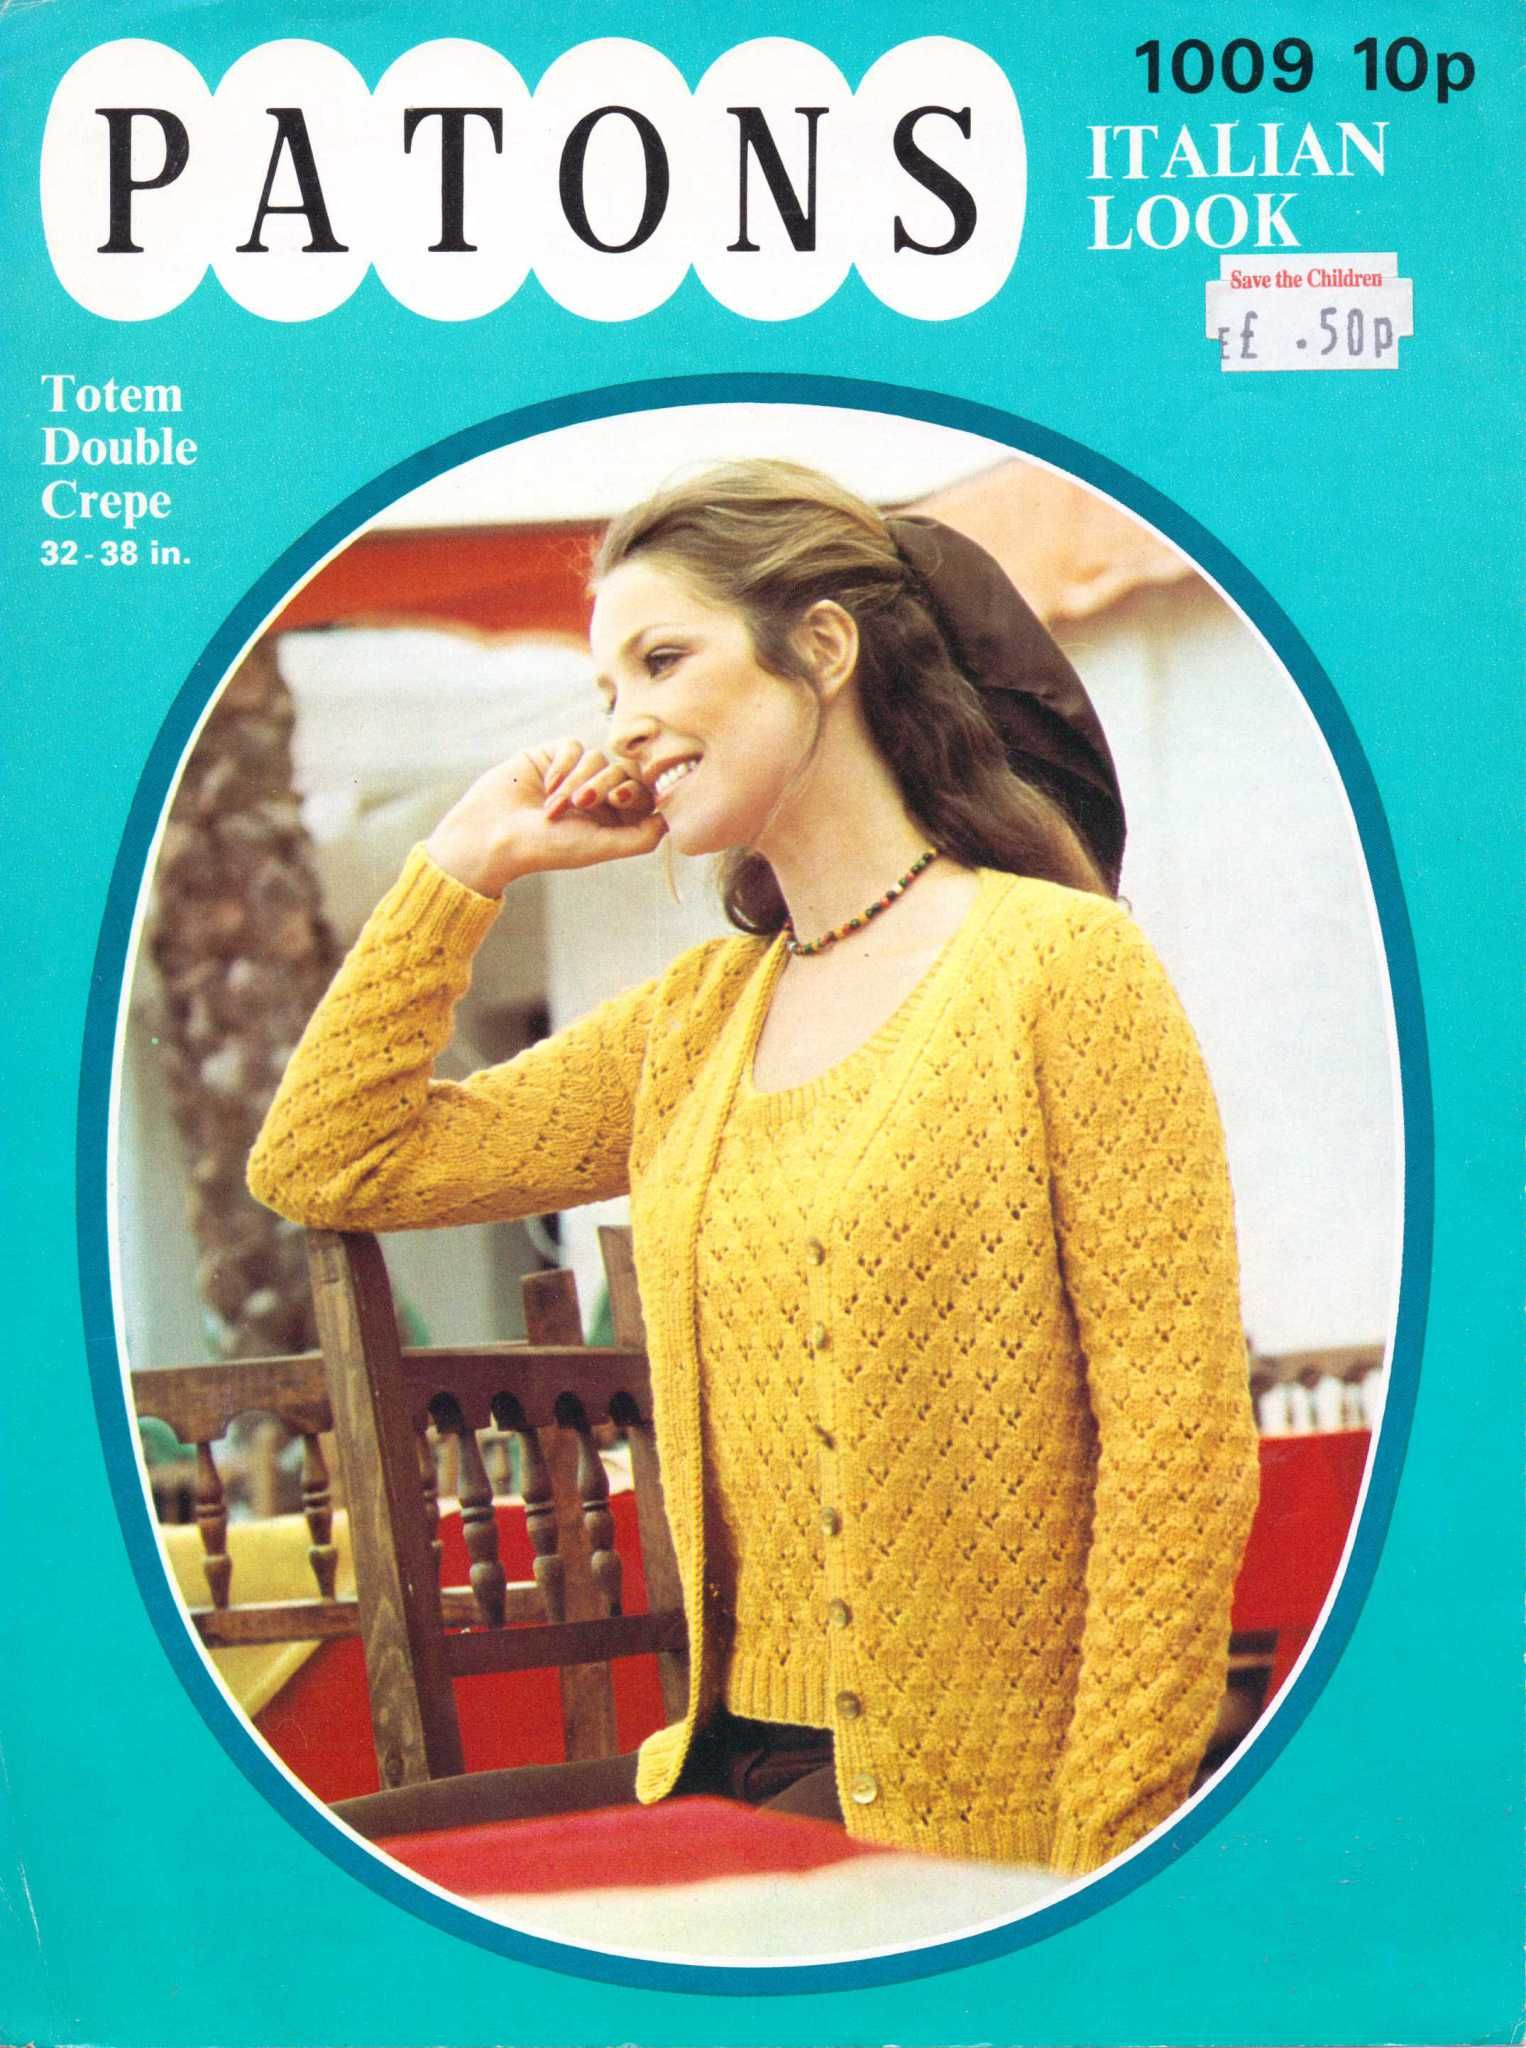 Patons 1009 ladies jumper free knitting pattern | knit | Pinterest